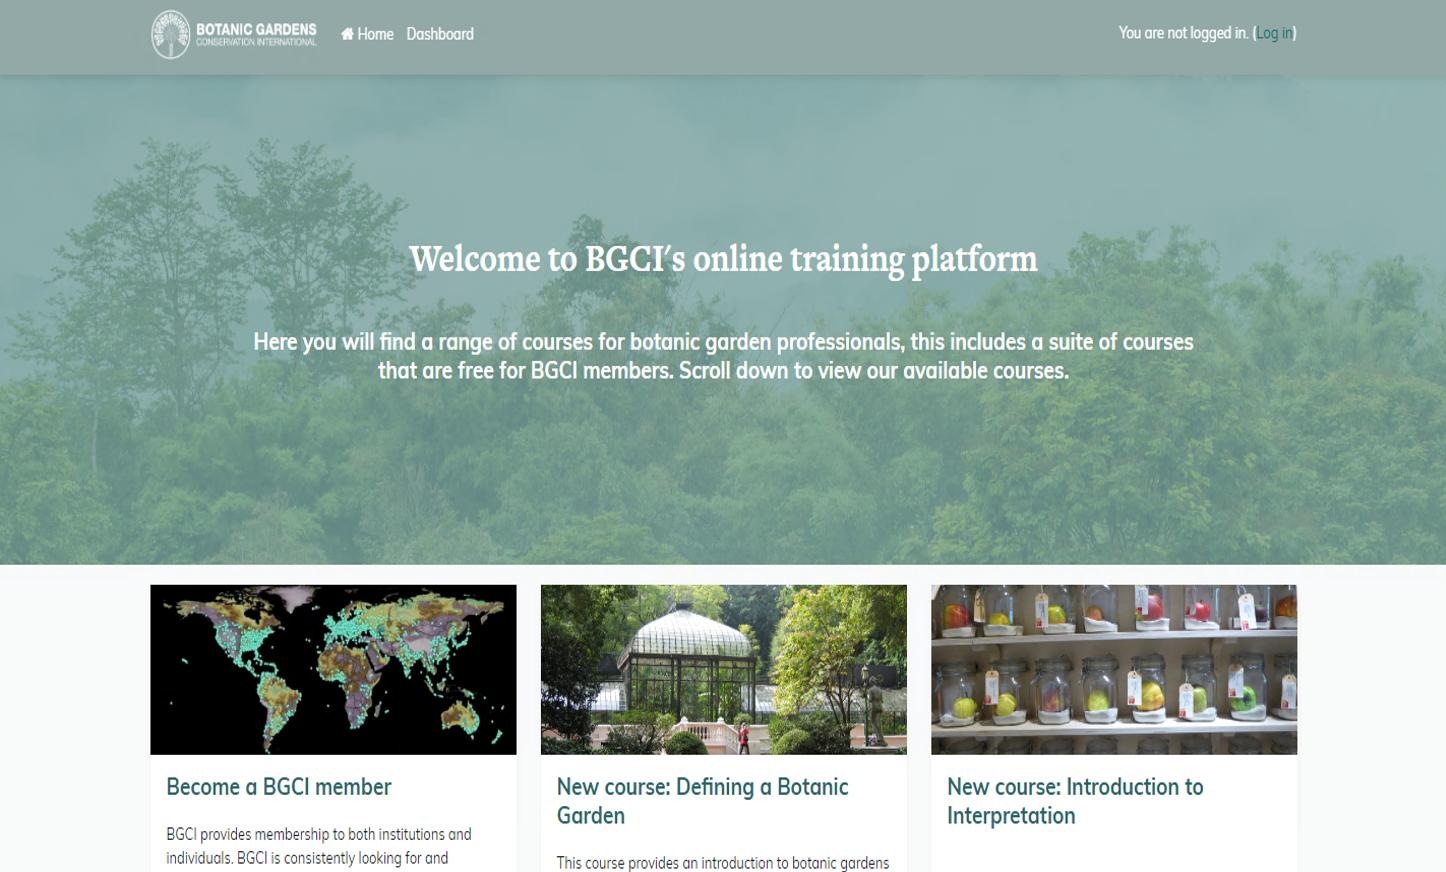 Training platform image